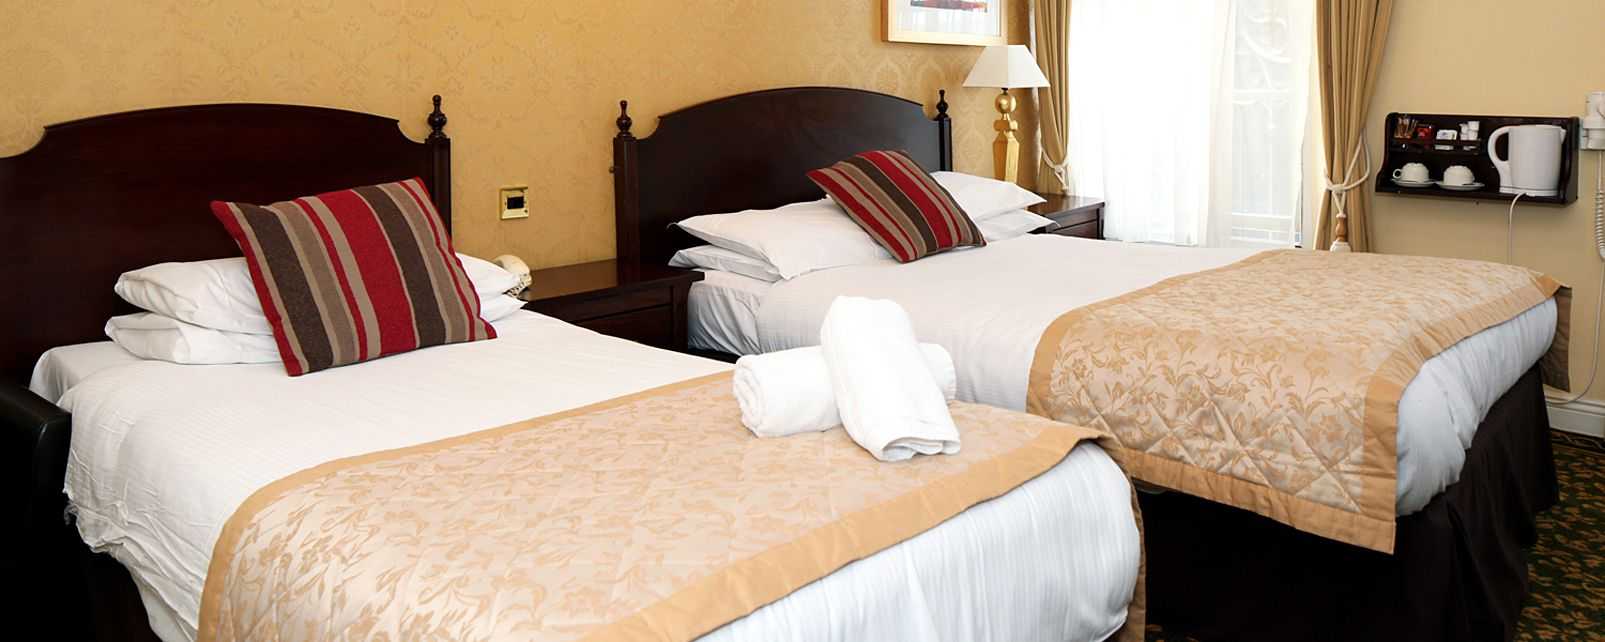 Hôtel Castle Hotel